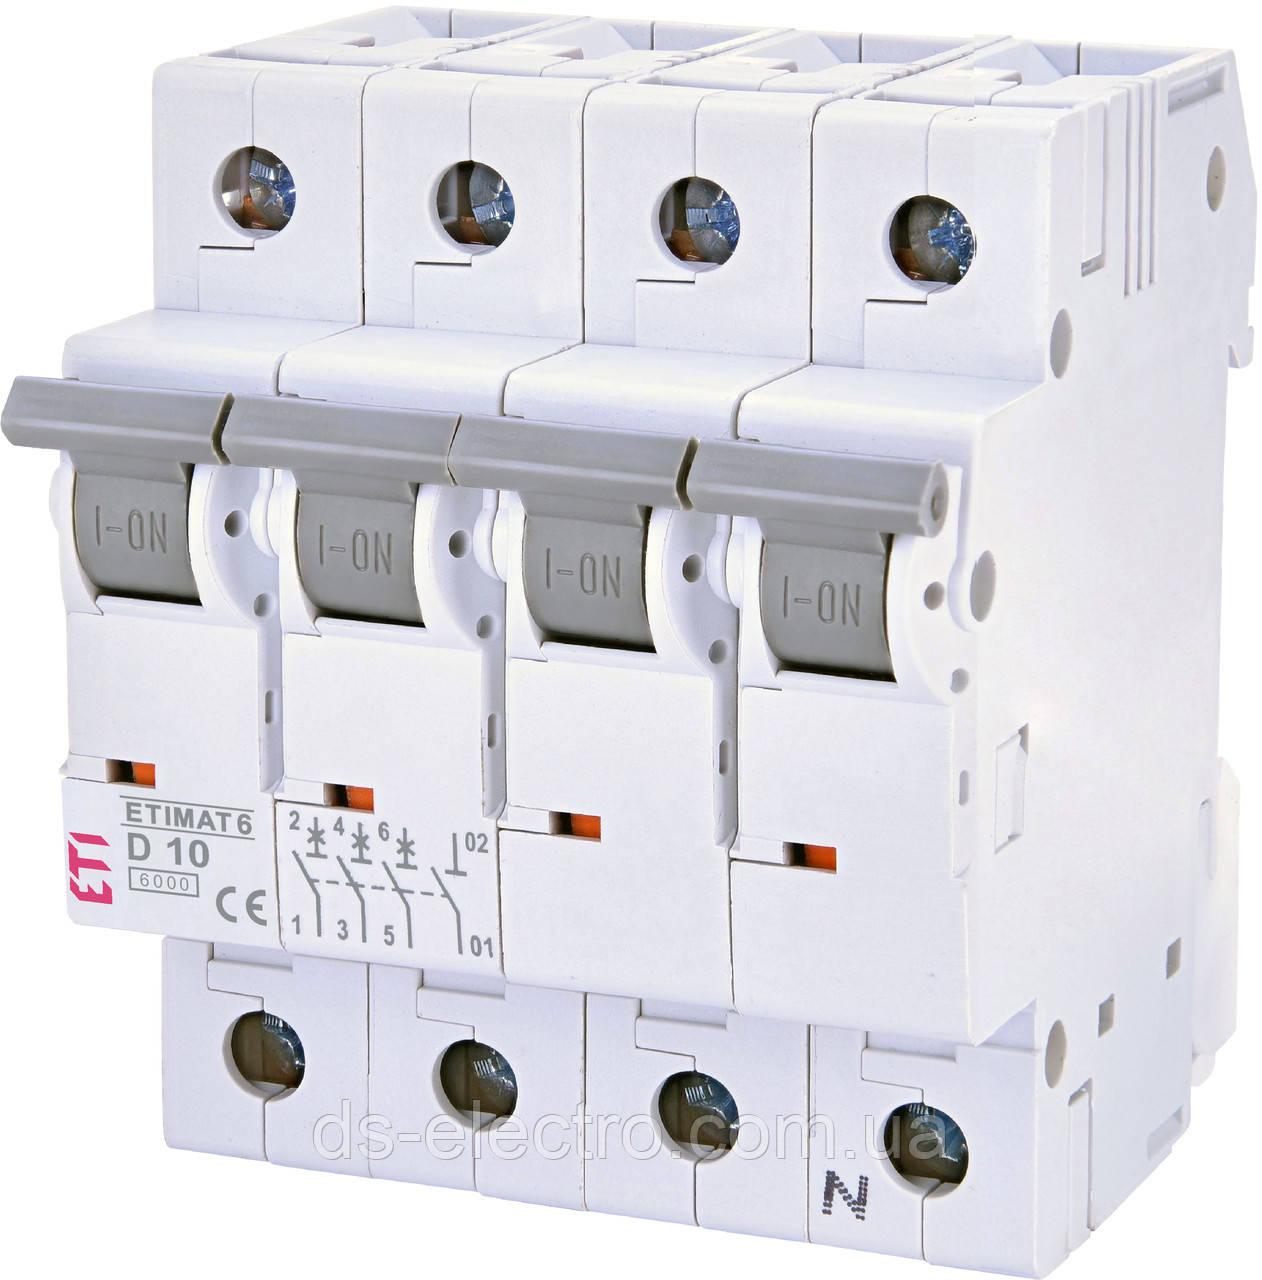 Авт. выключатель ETIMAT 6  3P+N D (6kA)